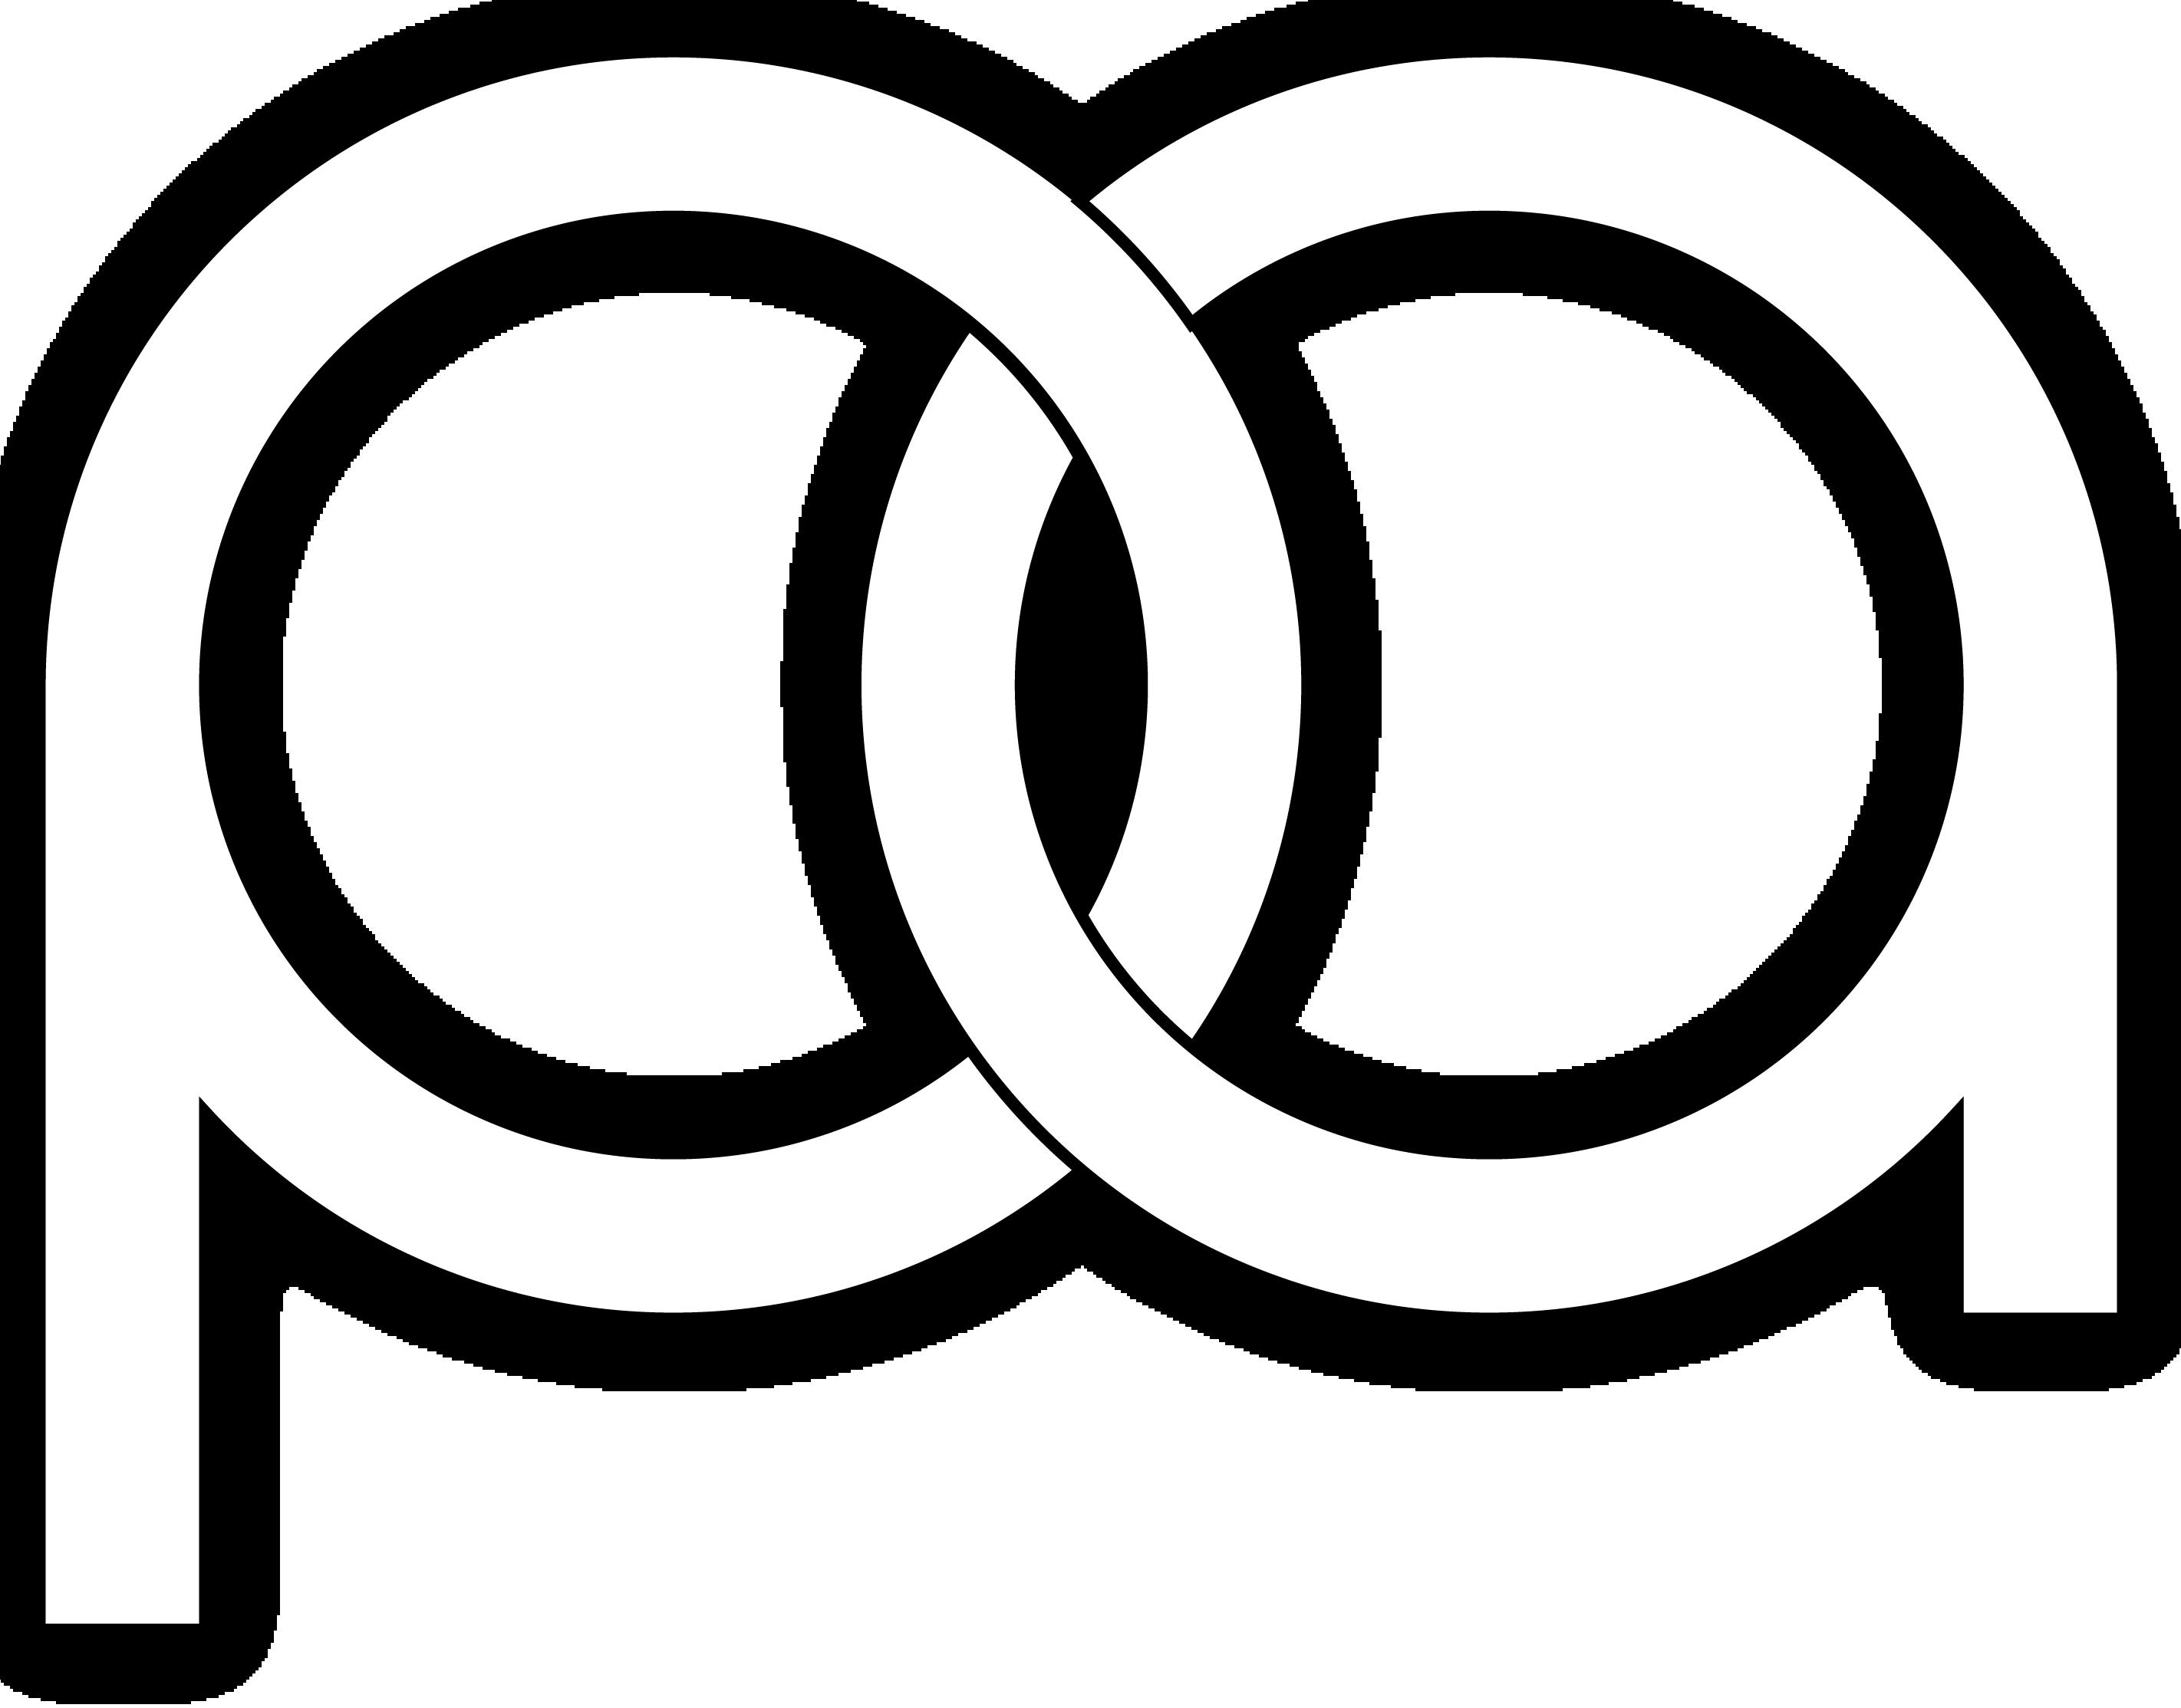 pa monogram